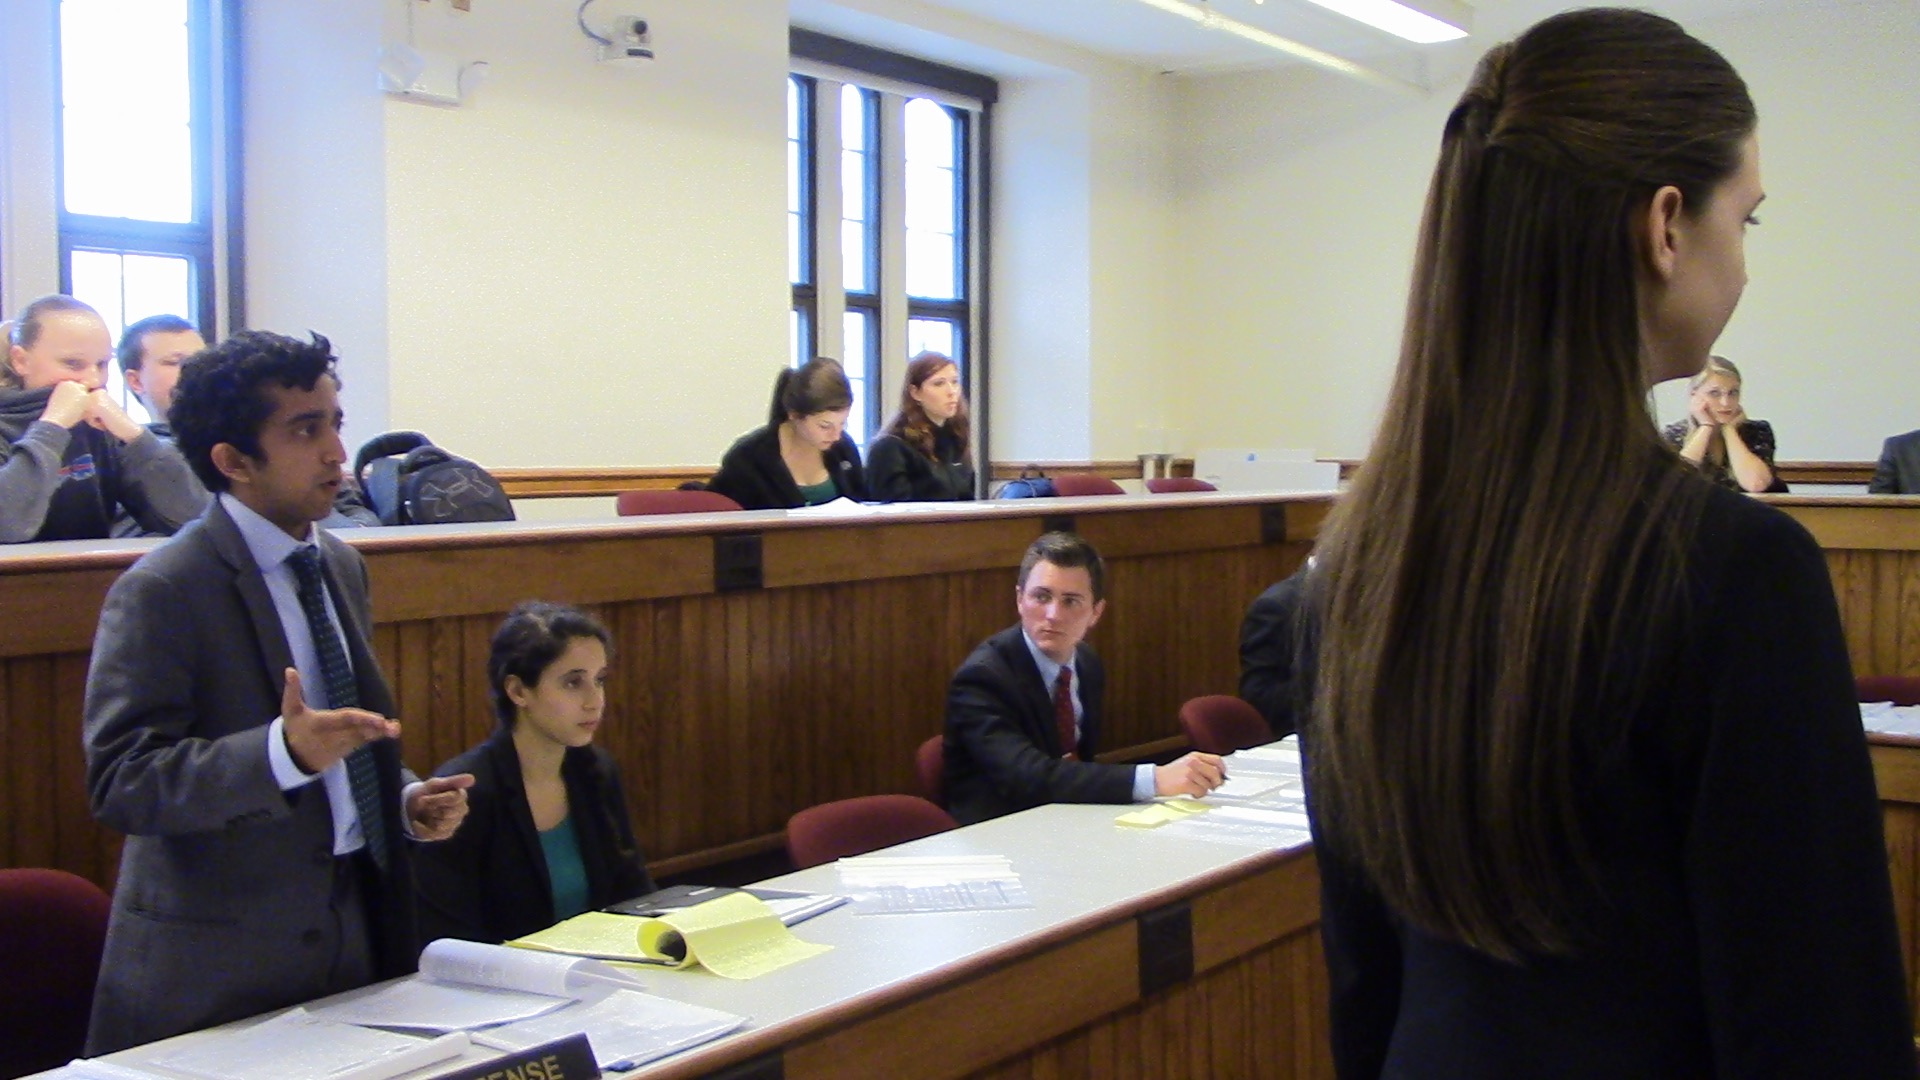 Brown B objects to Sophomore Tarah Mason's cross-examination